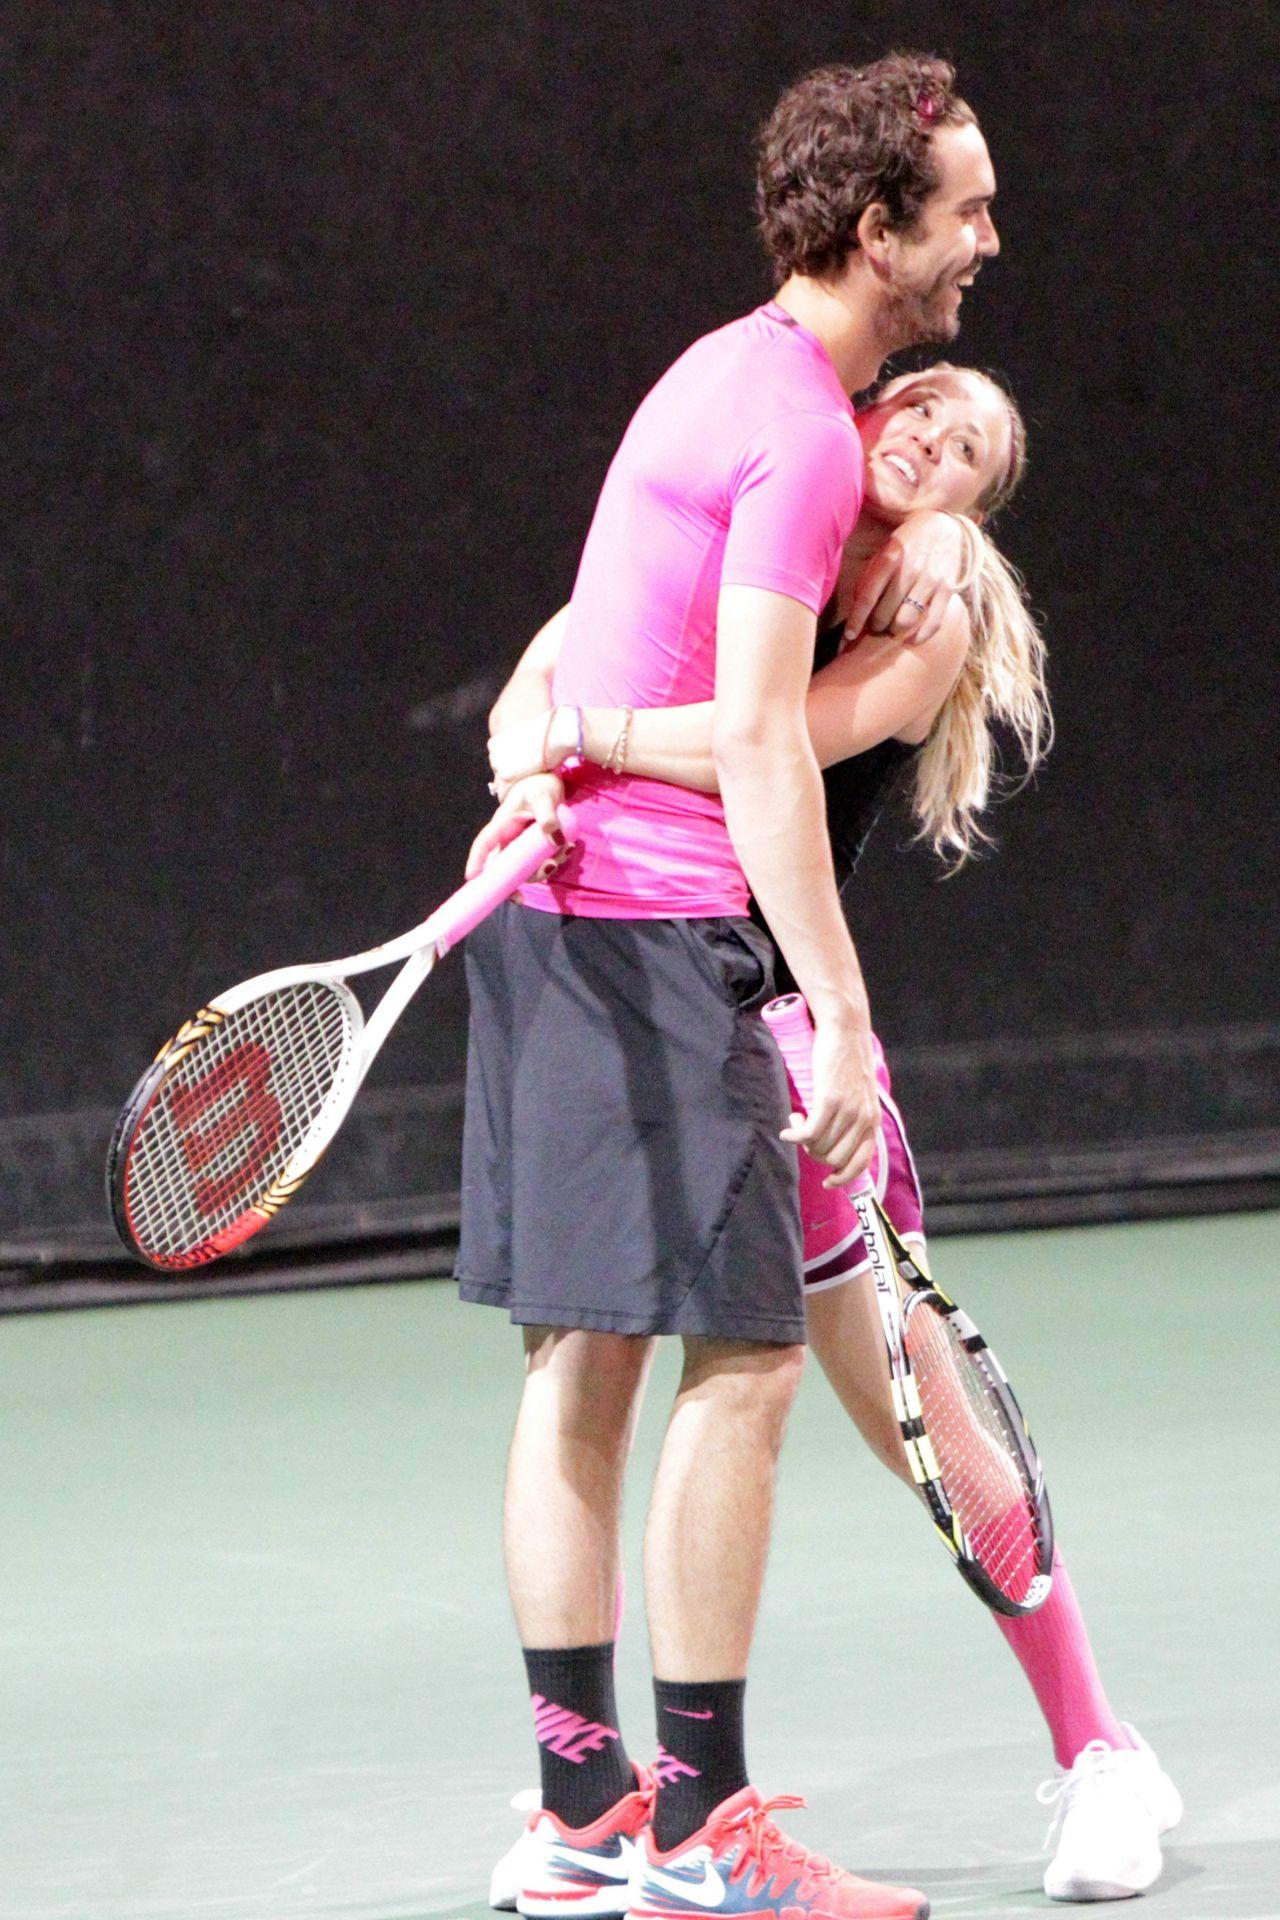 Helen Flanagan Twitter Kaley Cuoco - Tennis M...